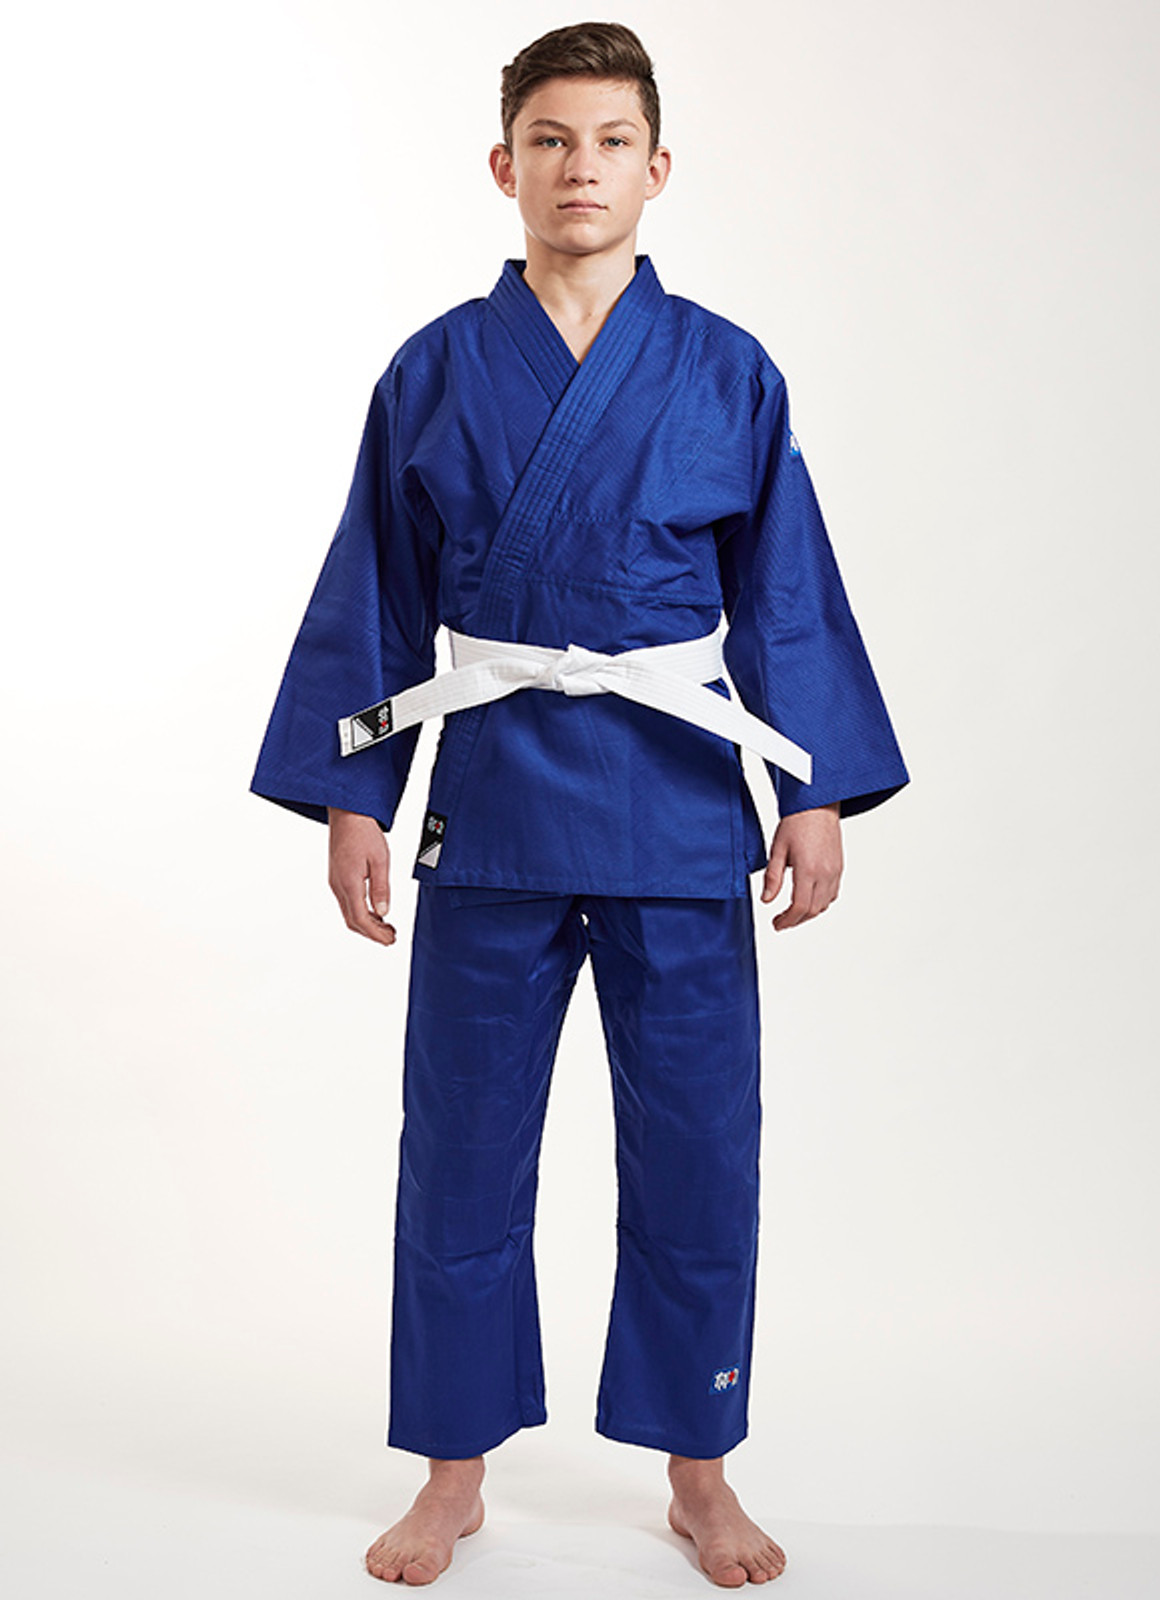 IPPON GEAR Kinder Judoanzug Beginner